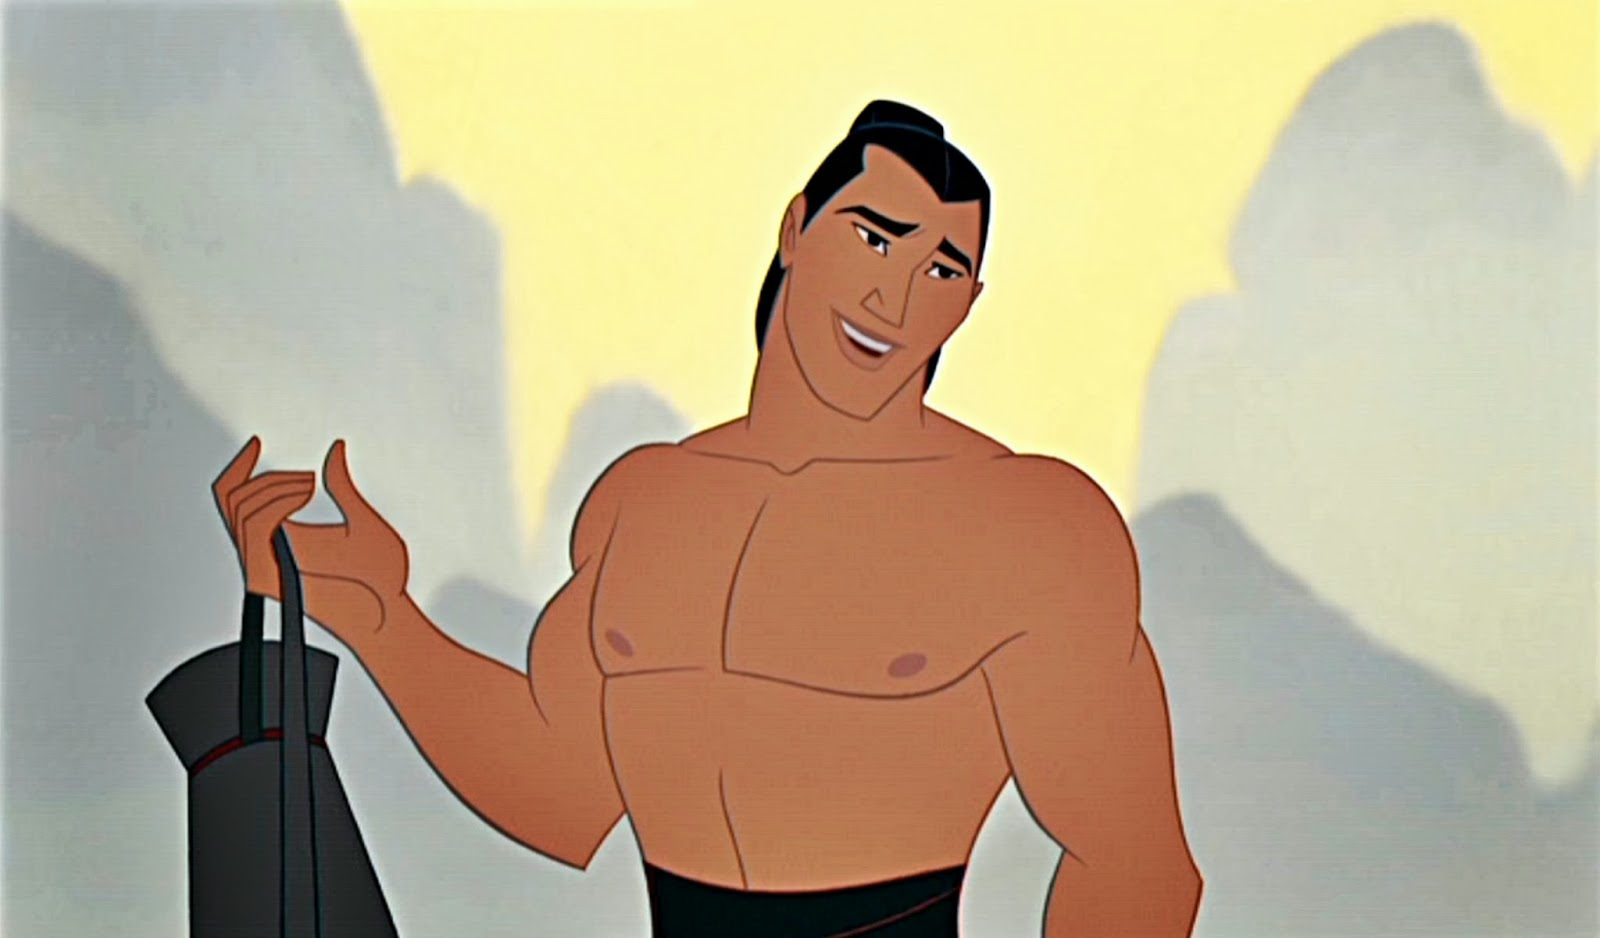 Walt-Disney-Screencaps-Captain-Li-Shang-walt-disney-characters ...